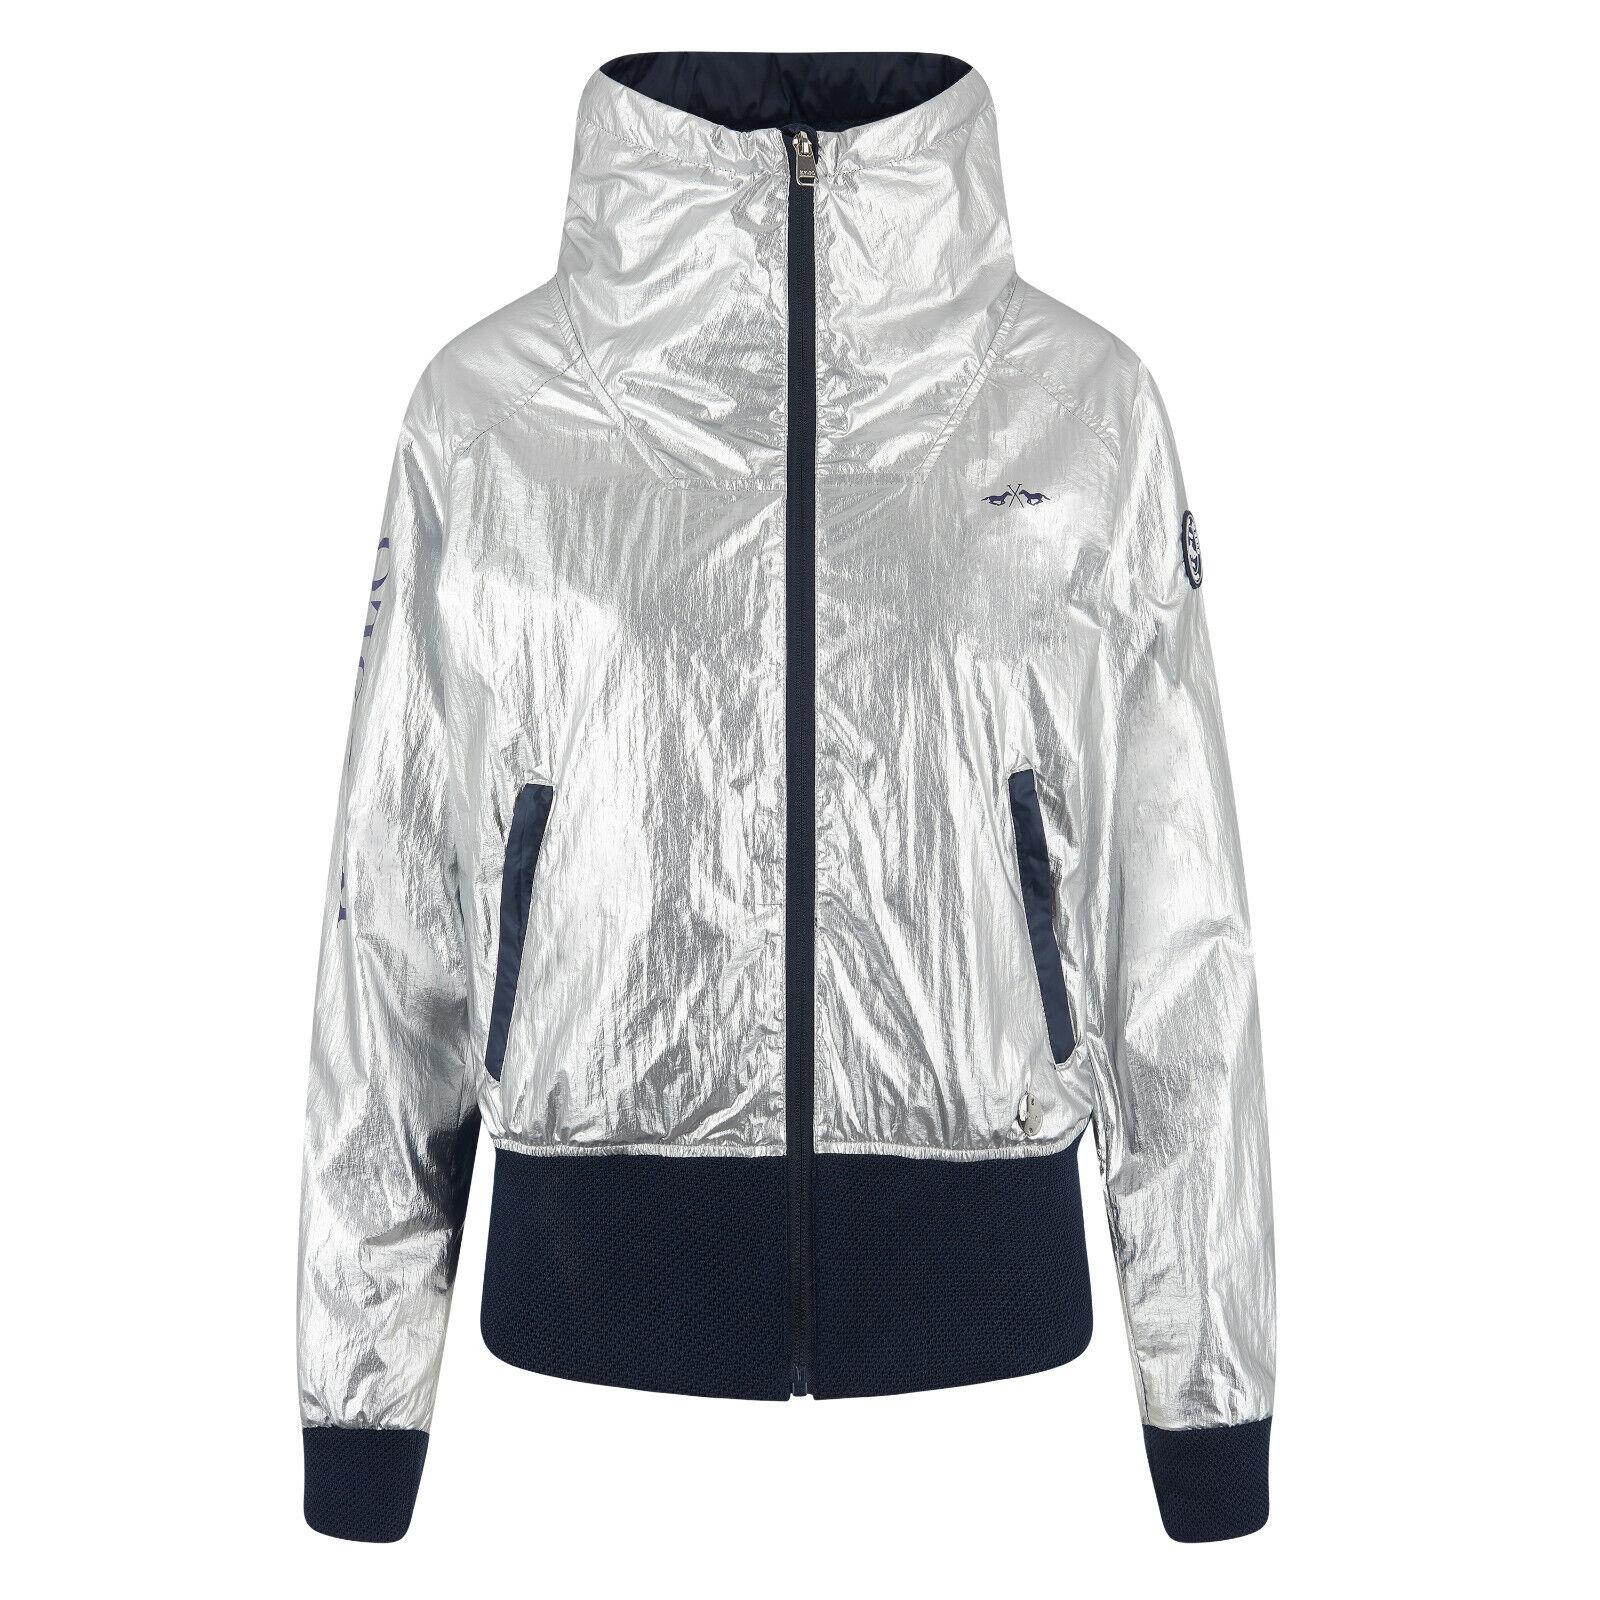 HV Polo Damen-Jacke Silver RV höherer Kragen Logodetails Sommer 2019